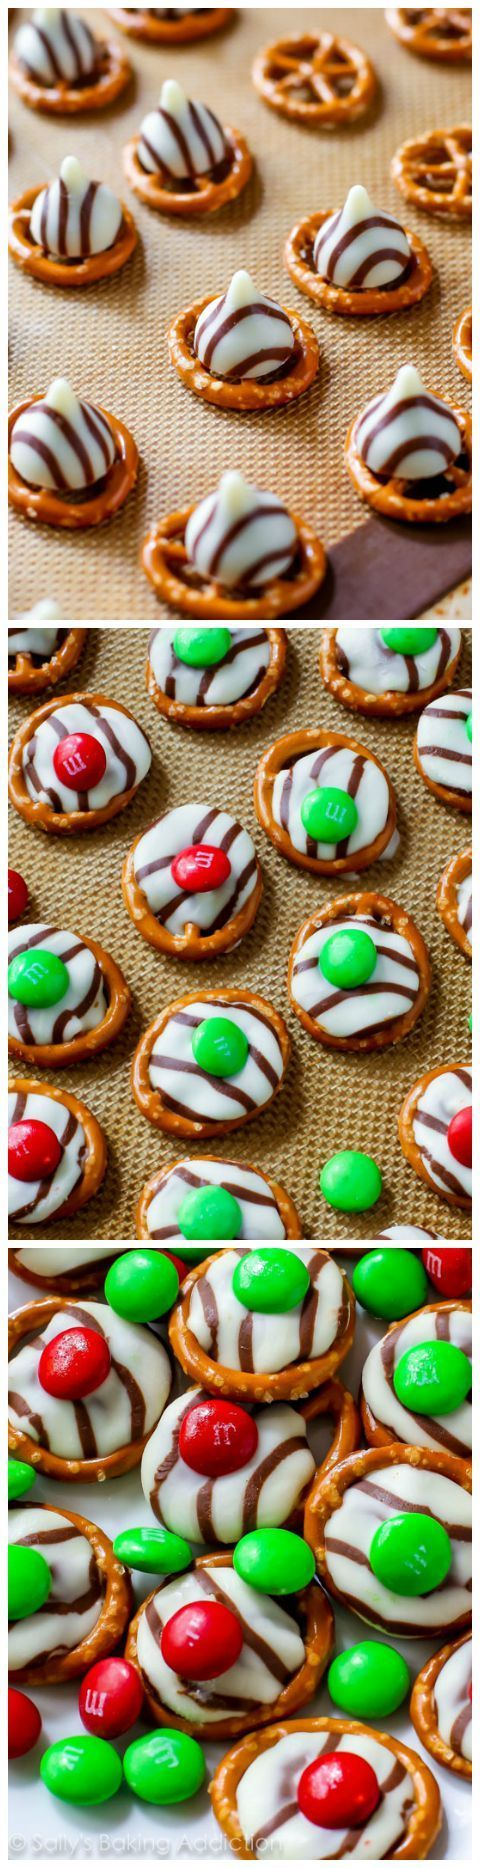 Want an easy holiday treat? Try these festive pretzel hug treats!